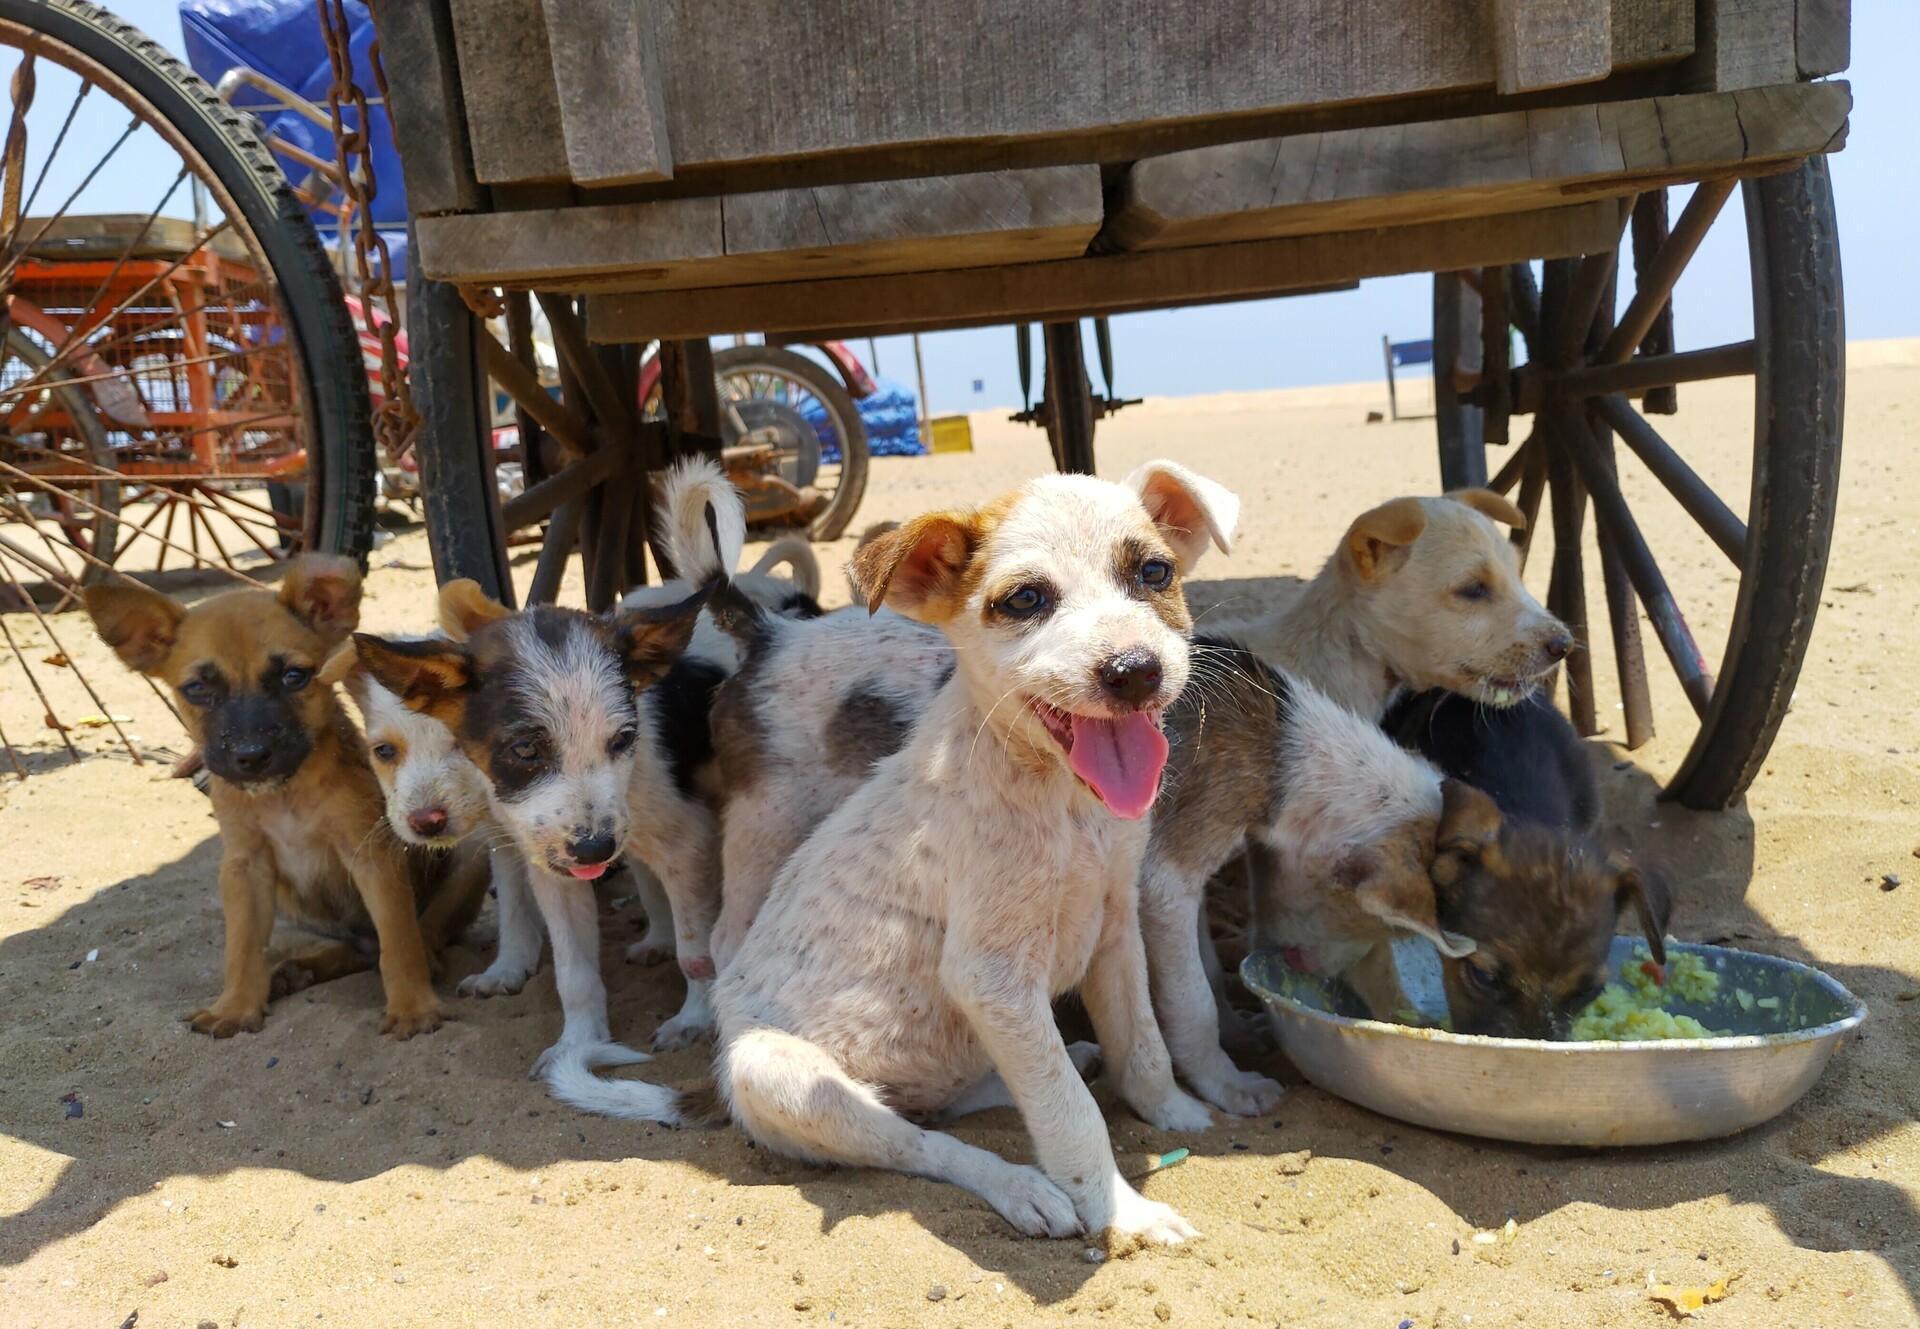 Streunerhunde in Indien